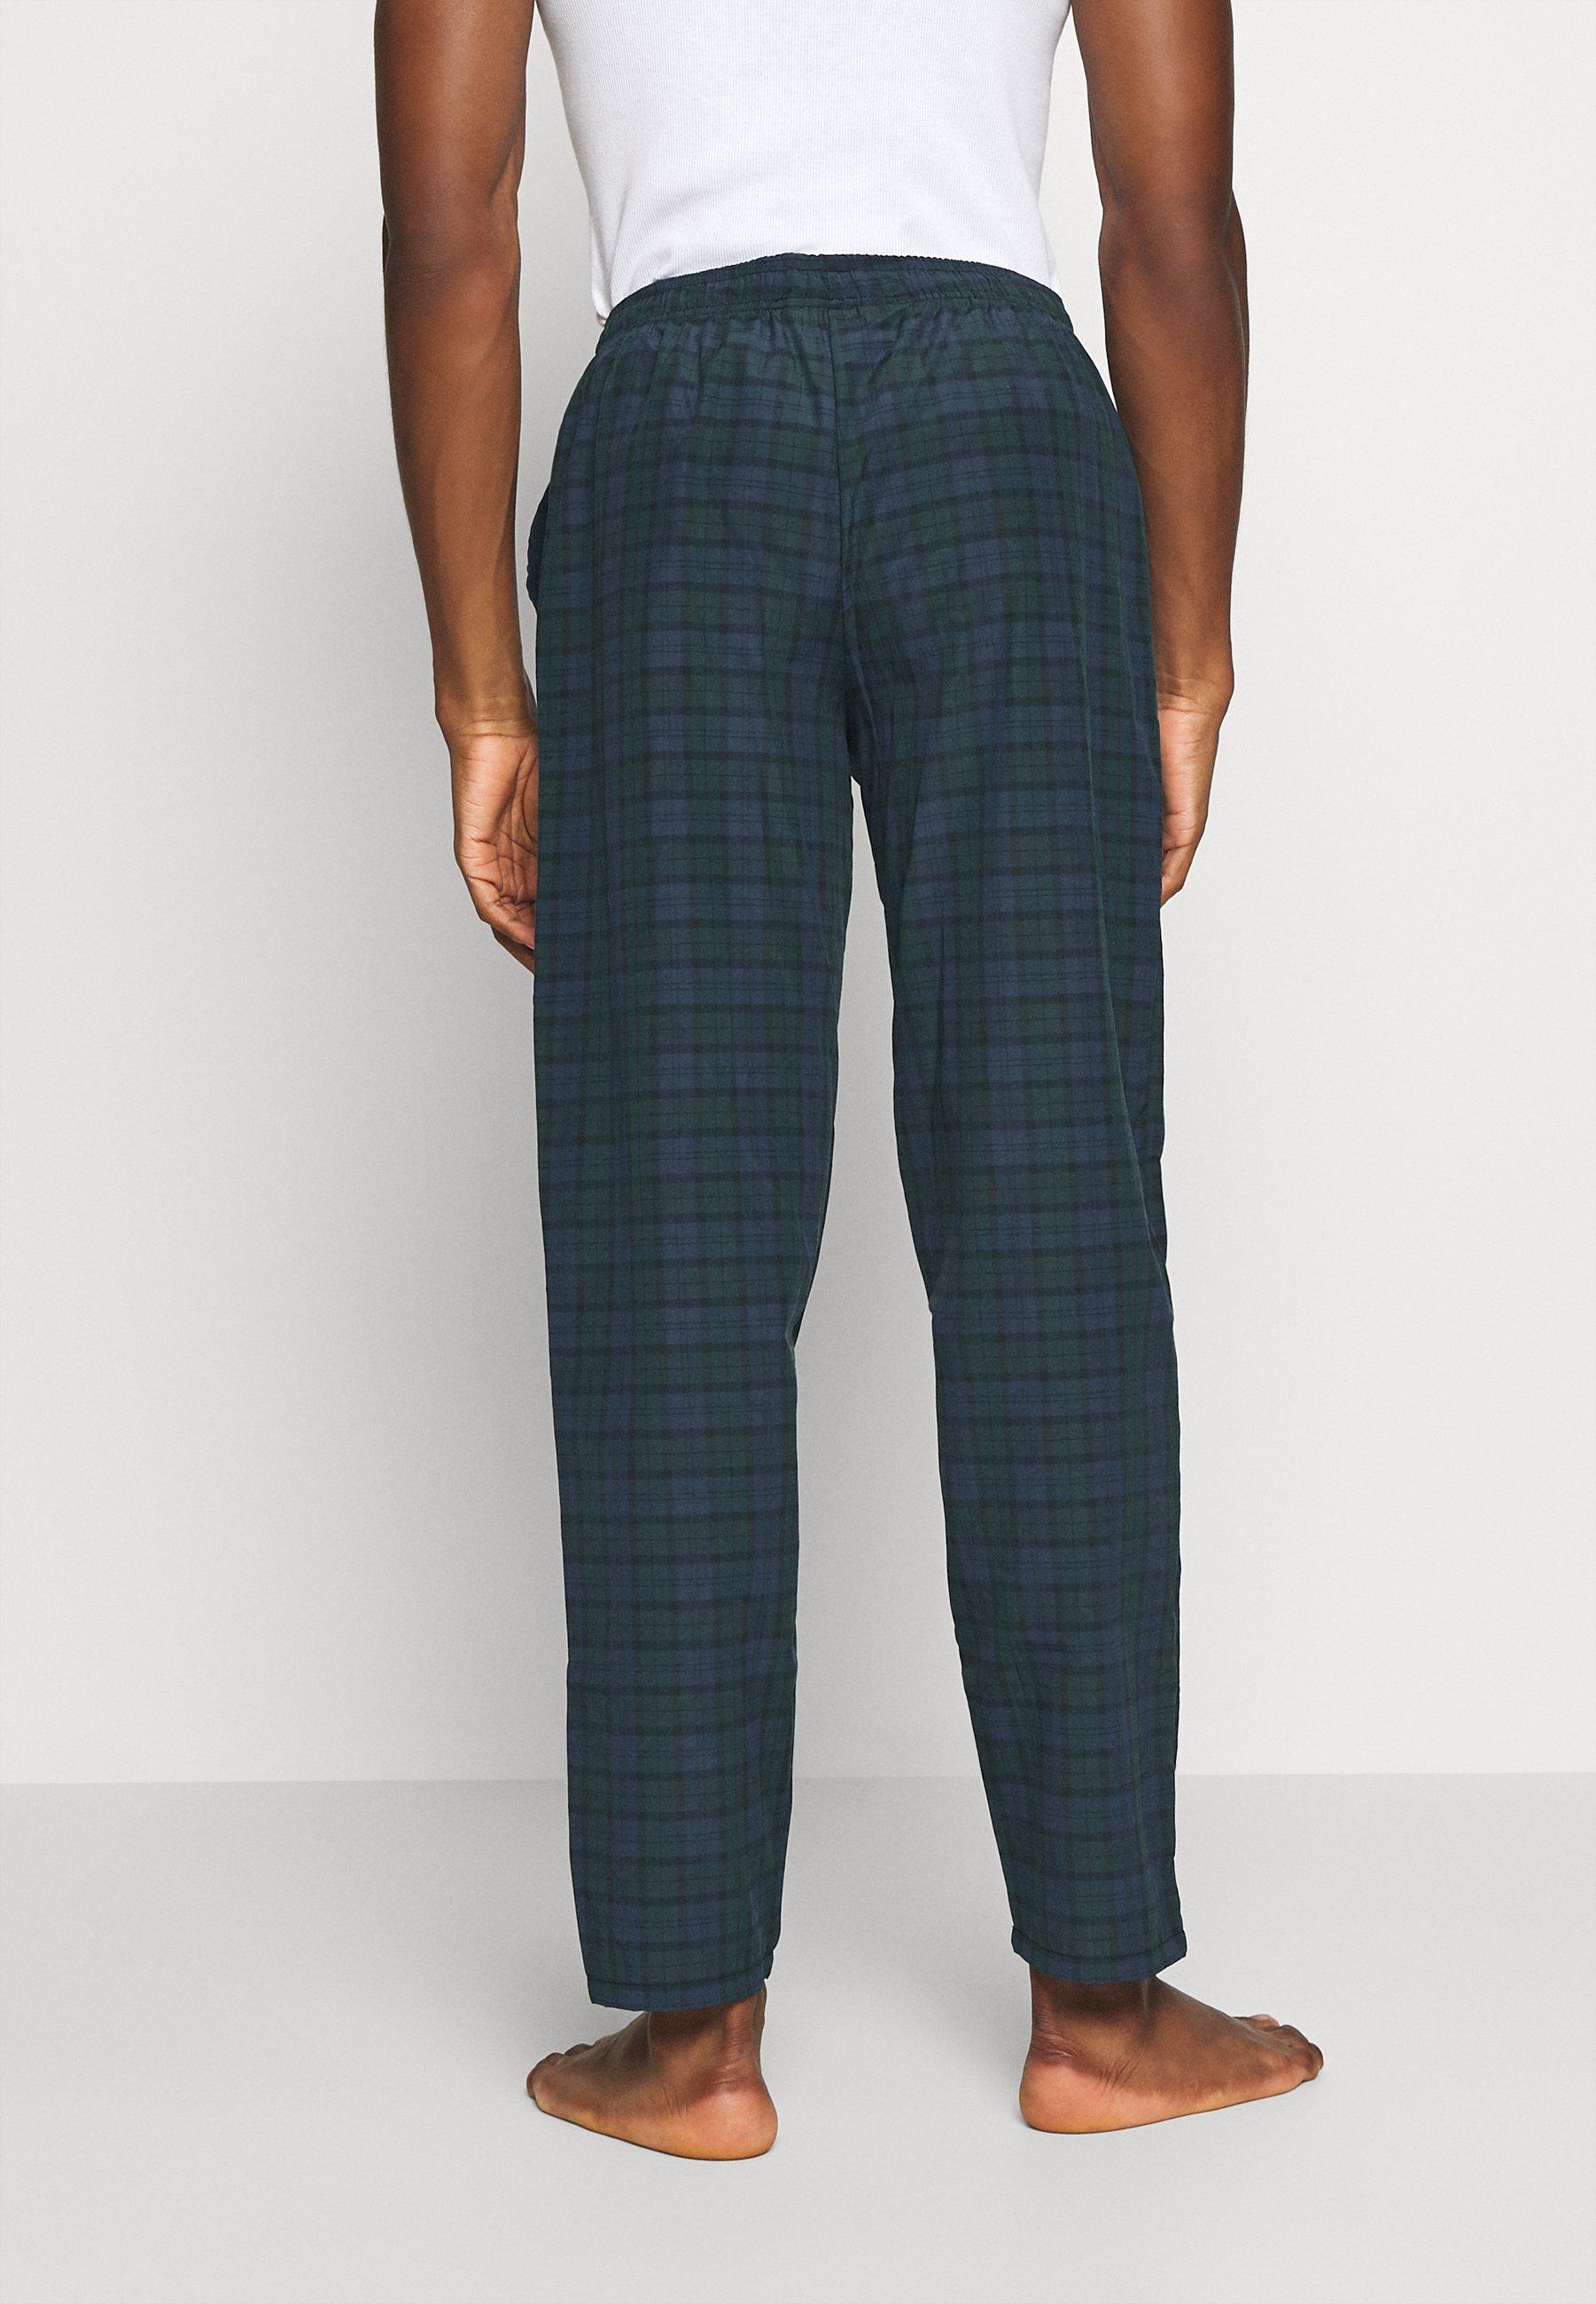 Pier One Pyjamasbukse - Dark Blue/green/mørkeblå